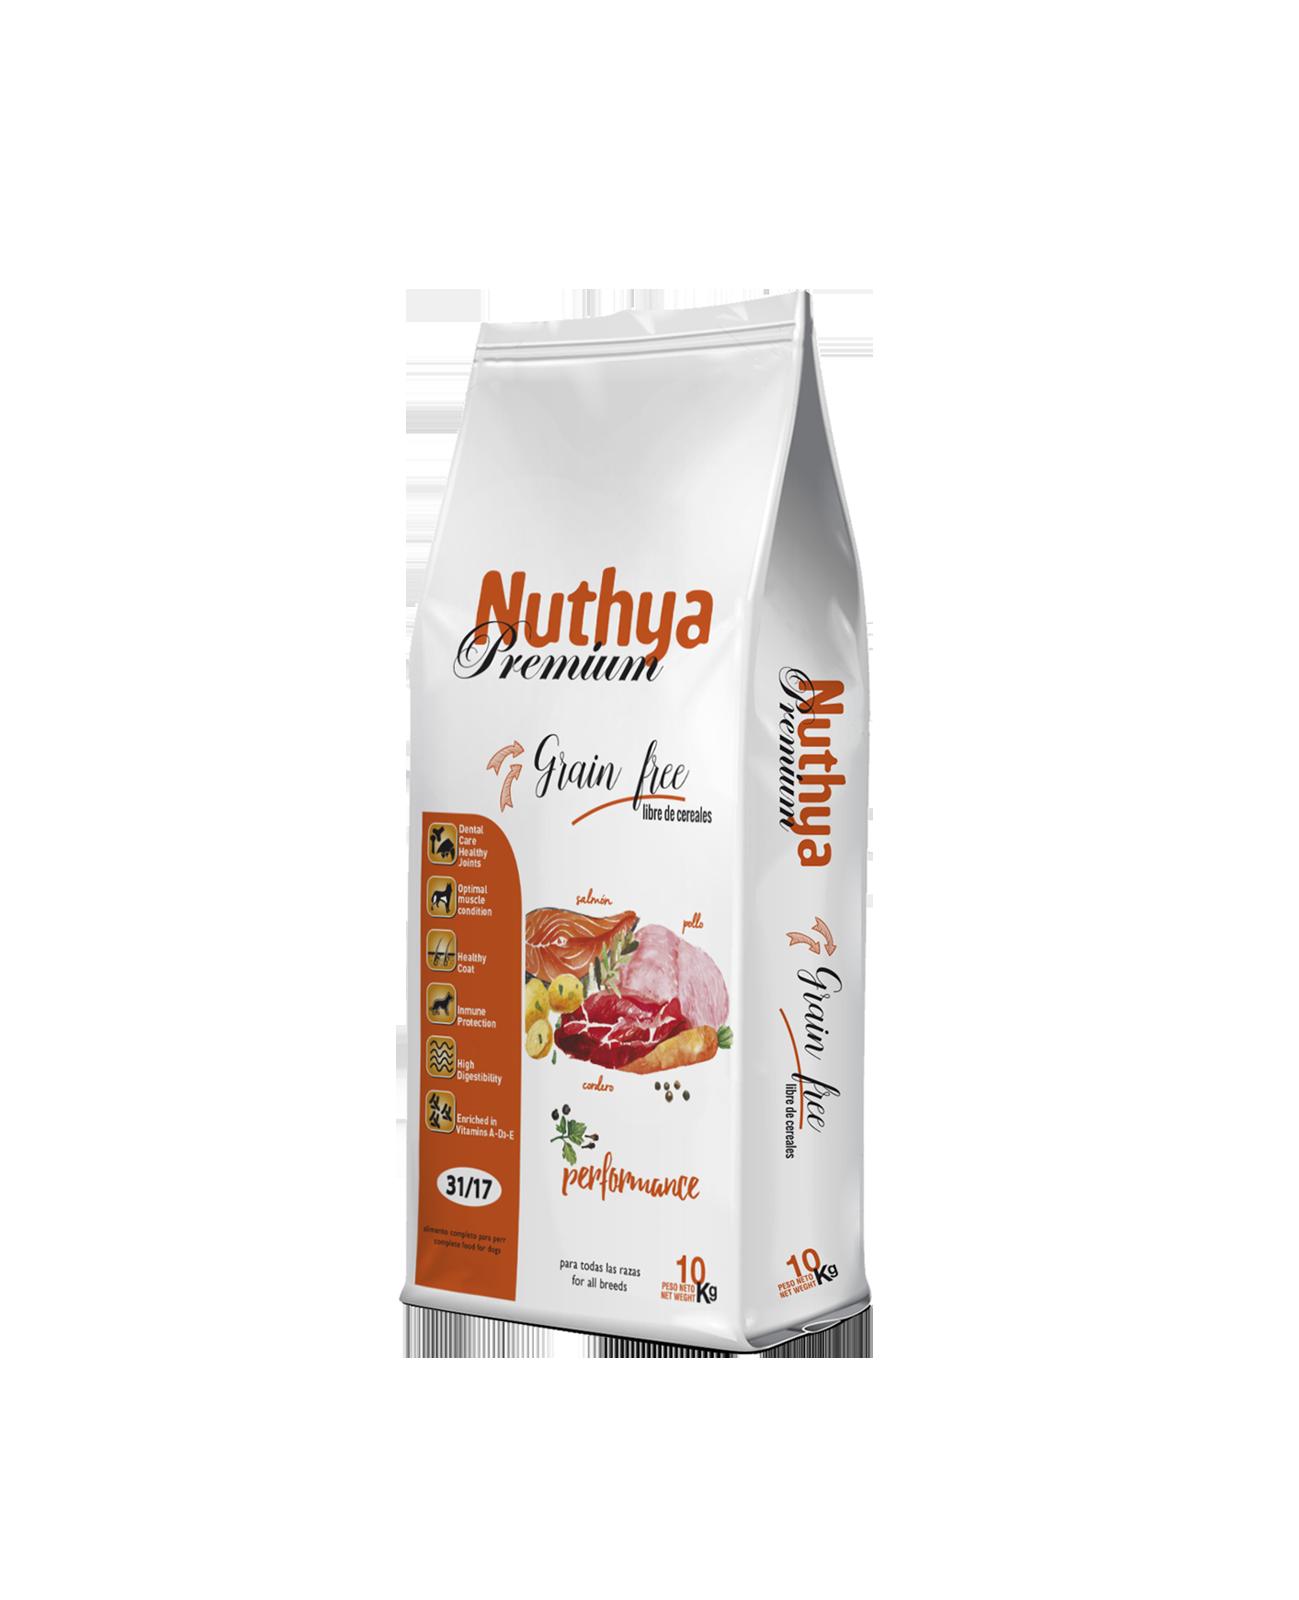 31/17 NUTHYA PREMIUM Performance Grain Free